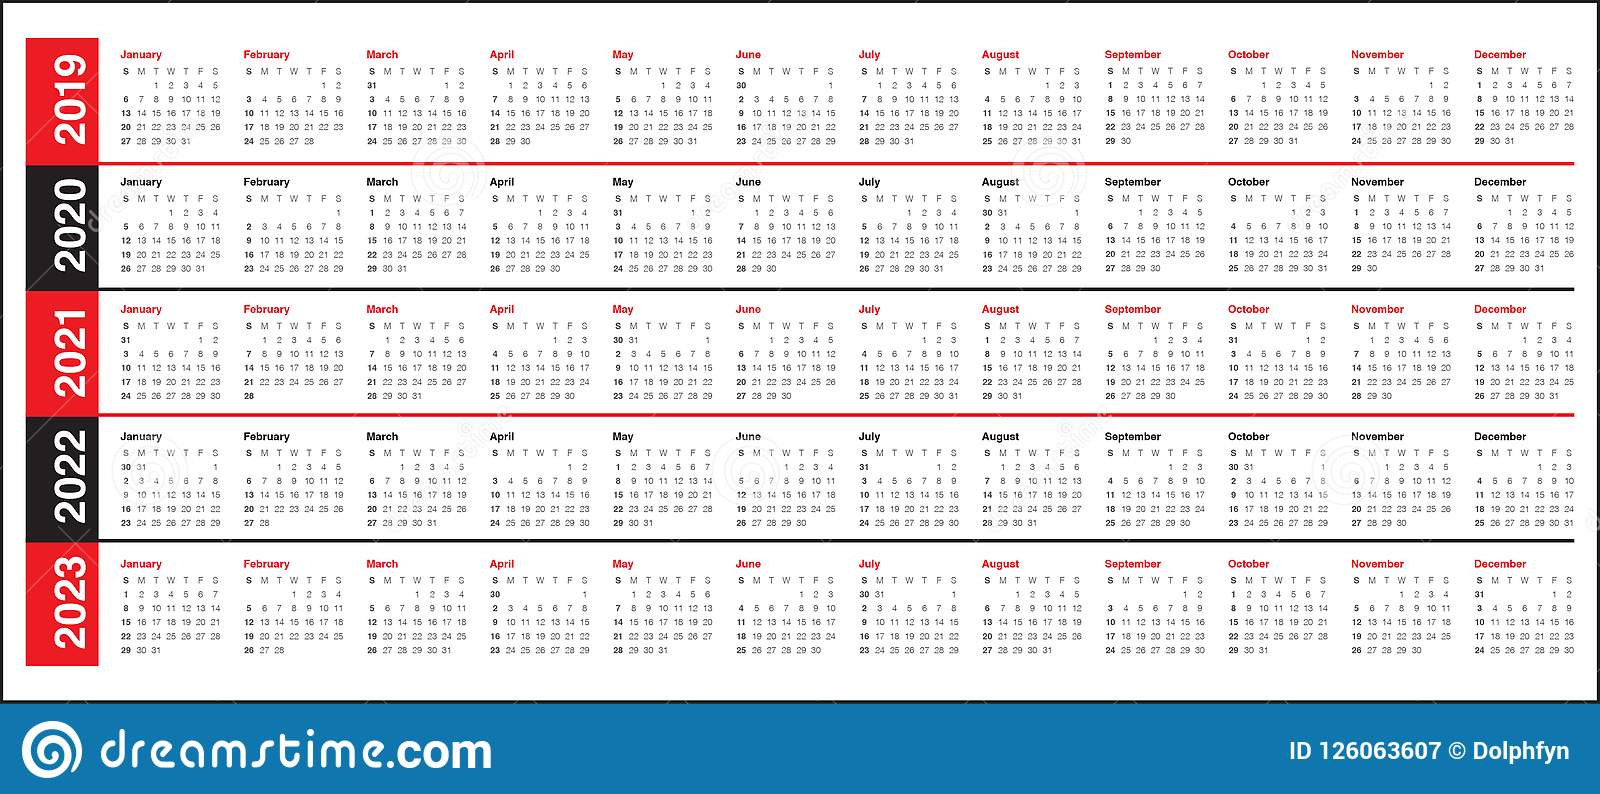 Year 2019 2020 2021 2022 2023 Calendar Vector Design Template Stock regarding Free Prinable Calenders 2020 To 2023